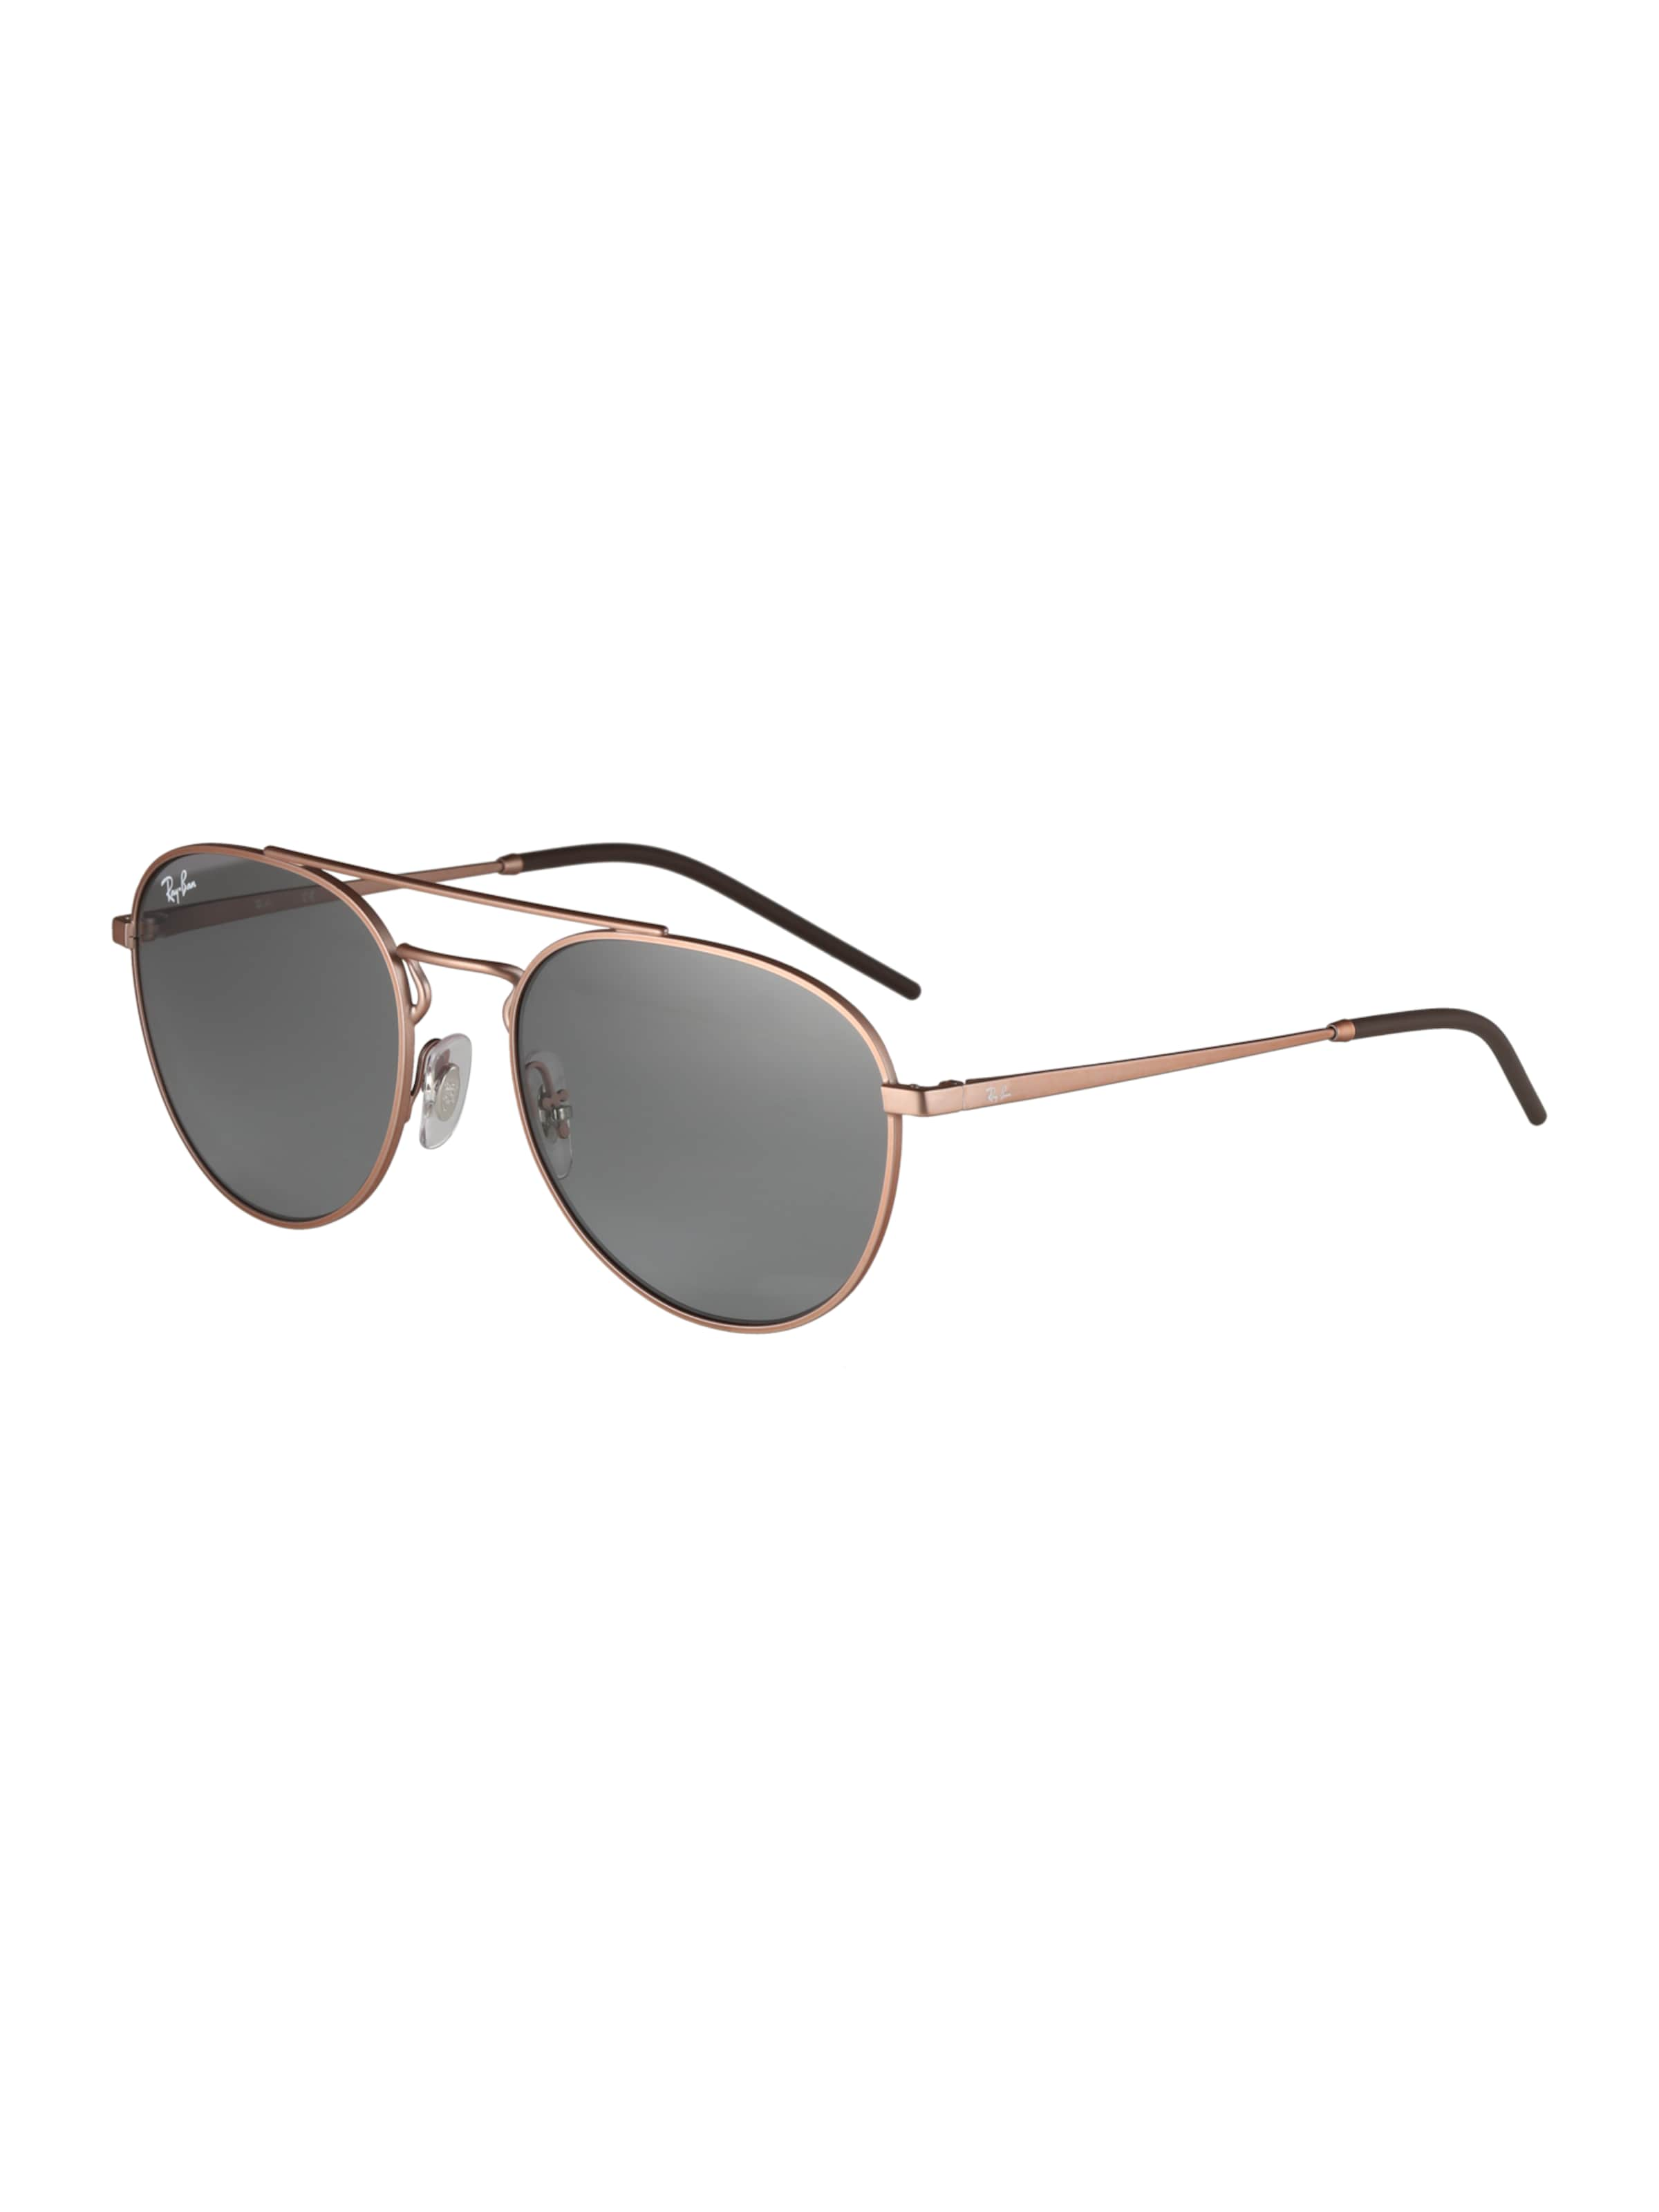 Ray ban ban Pilotenbrille Gold Pilotenbrille Ray In fg6Yb7y